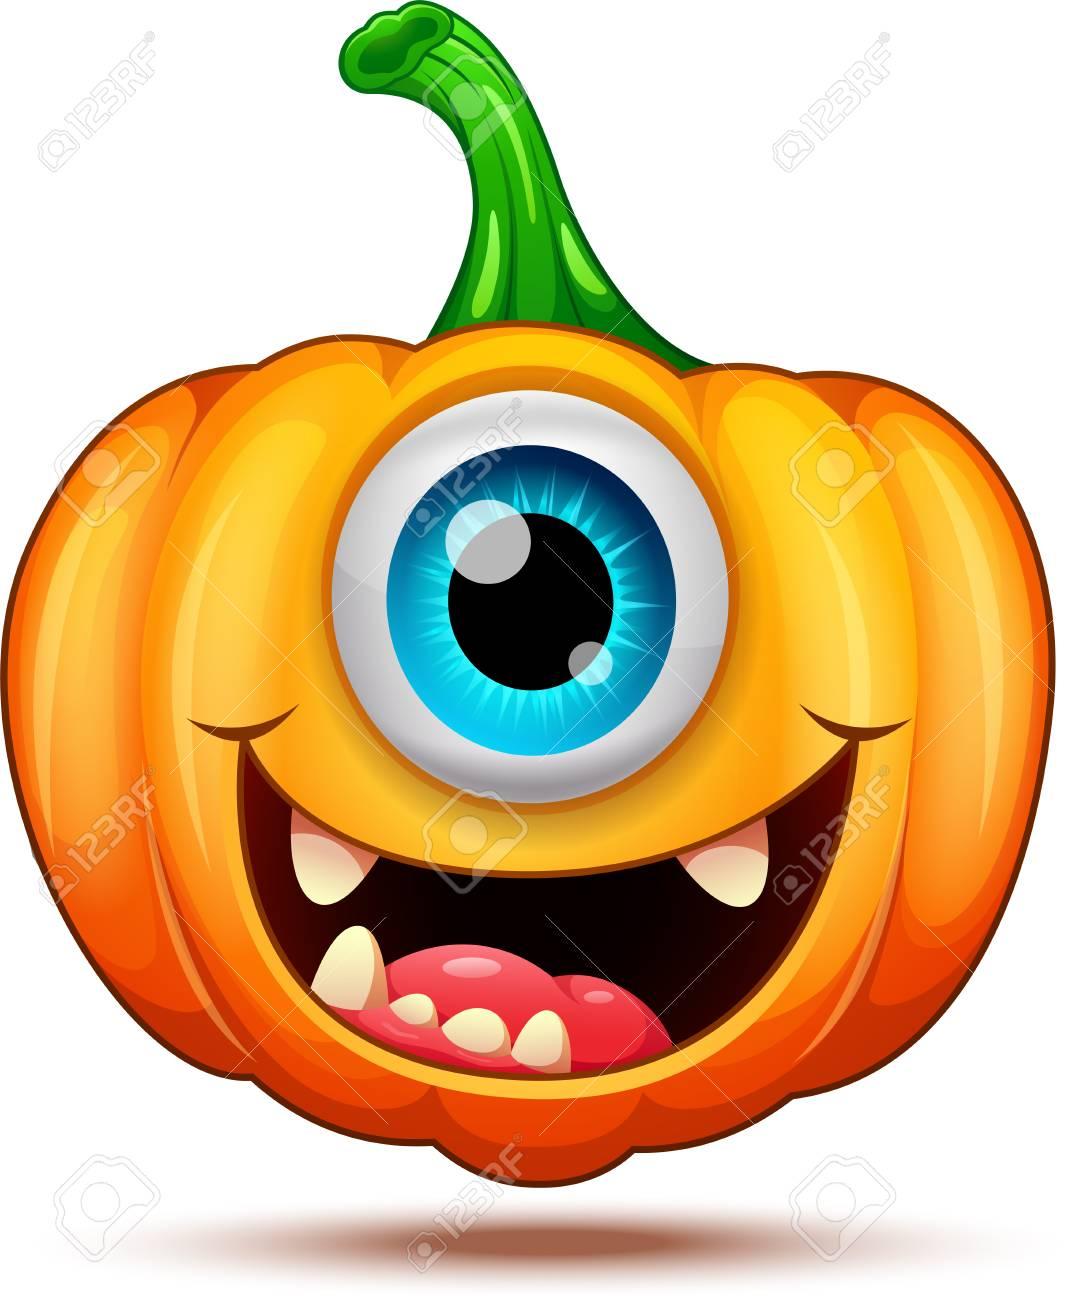 Funny pumpkin characters - 109767042